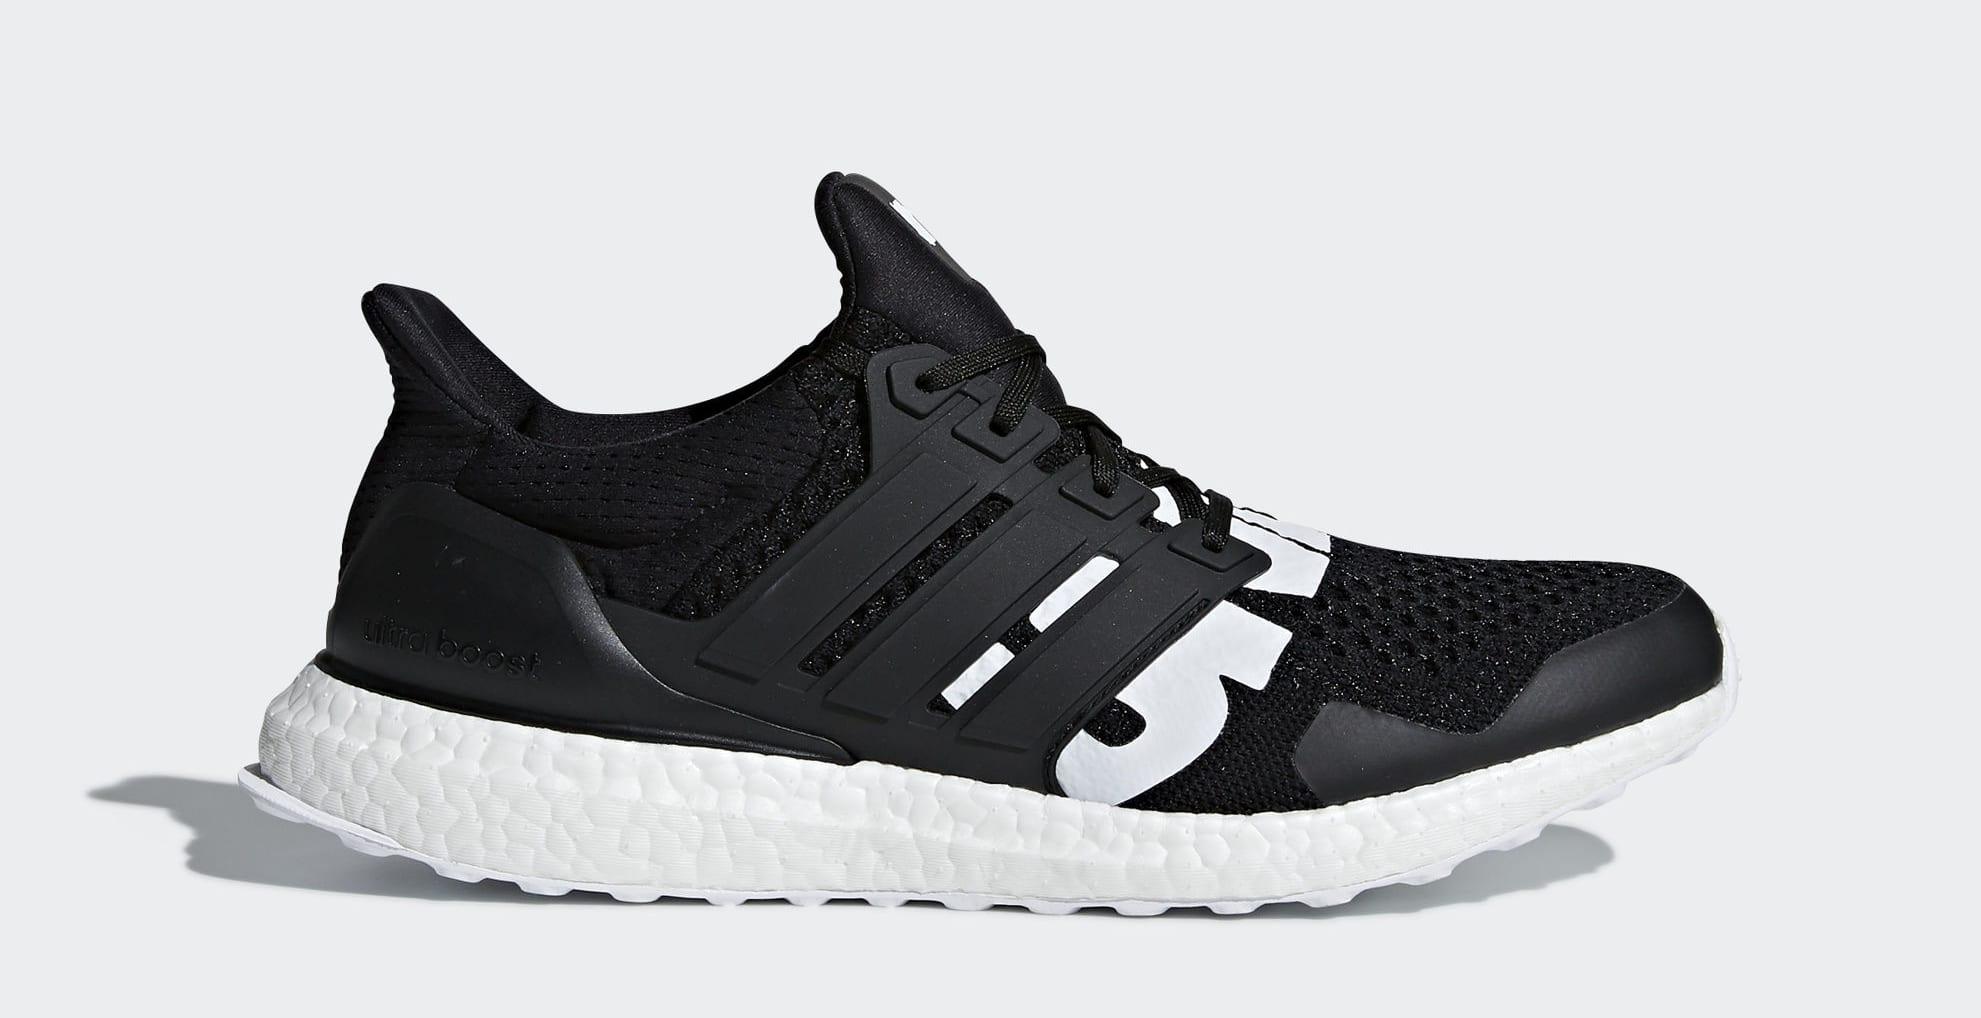 54cc448828519 low price adidas ultra boost sizing reddit da355 8131b